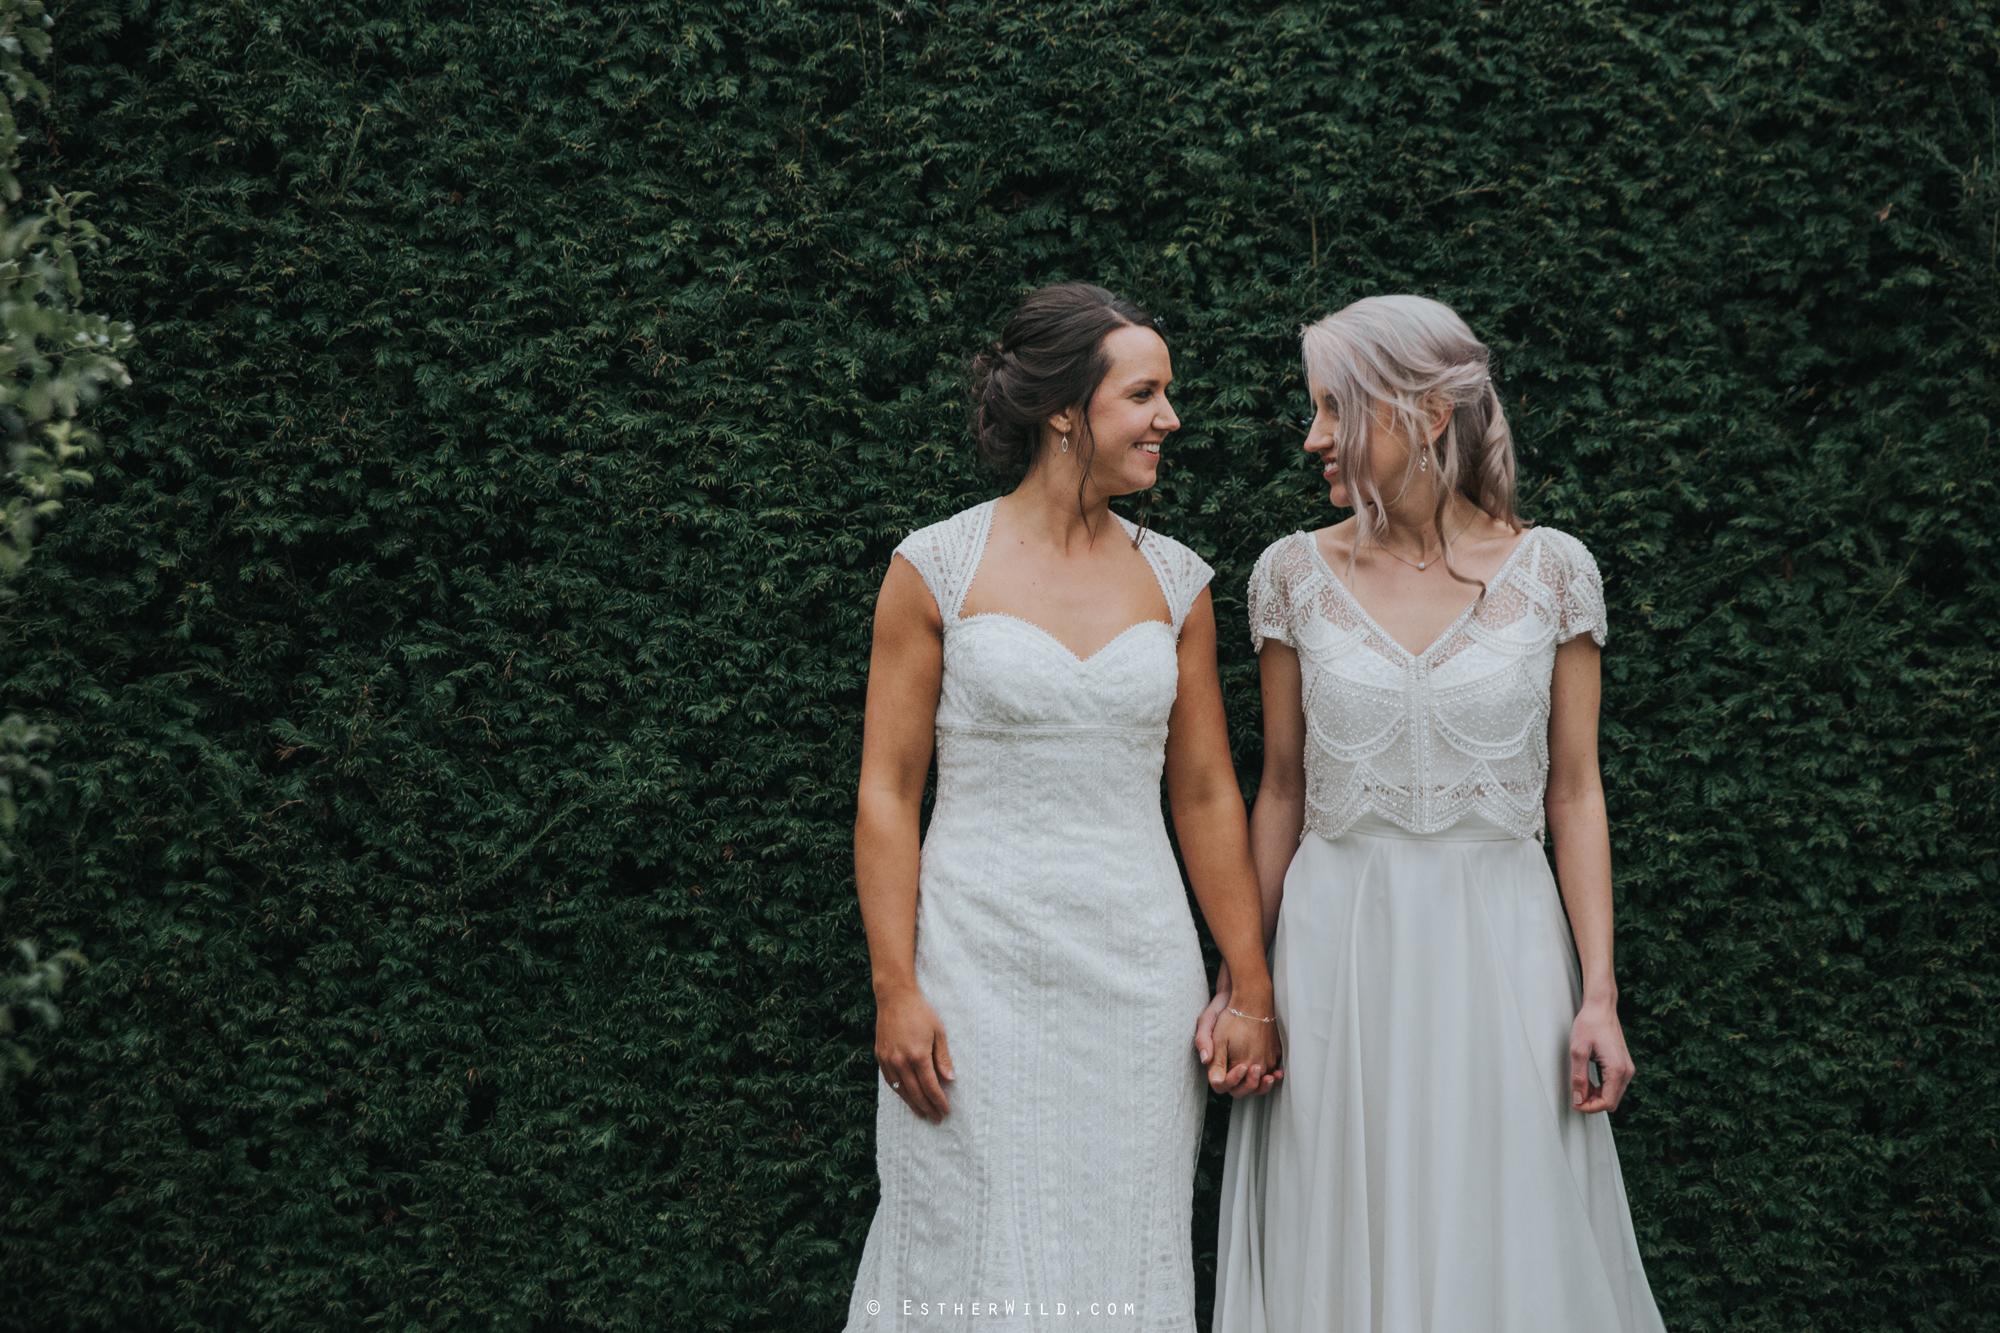 Elms_Barn_Weddings_Suffolk_Photographer_Copyright_Esther_Wild_IMG_2132.jpg